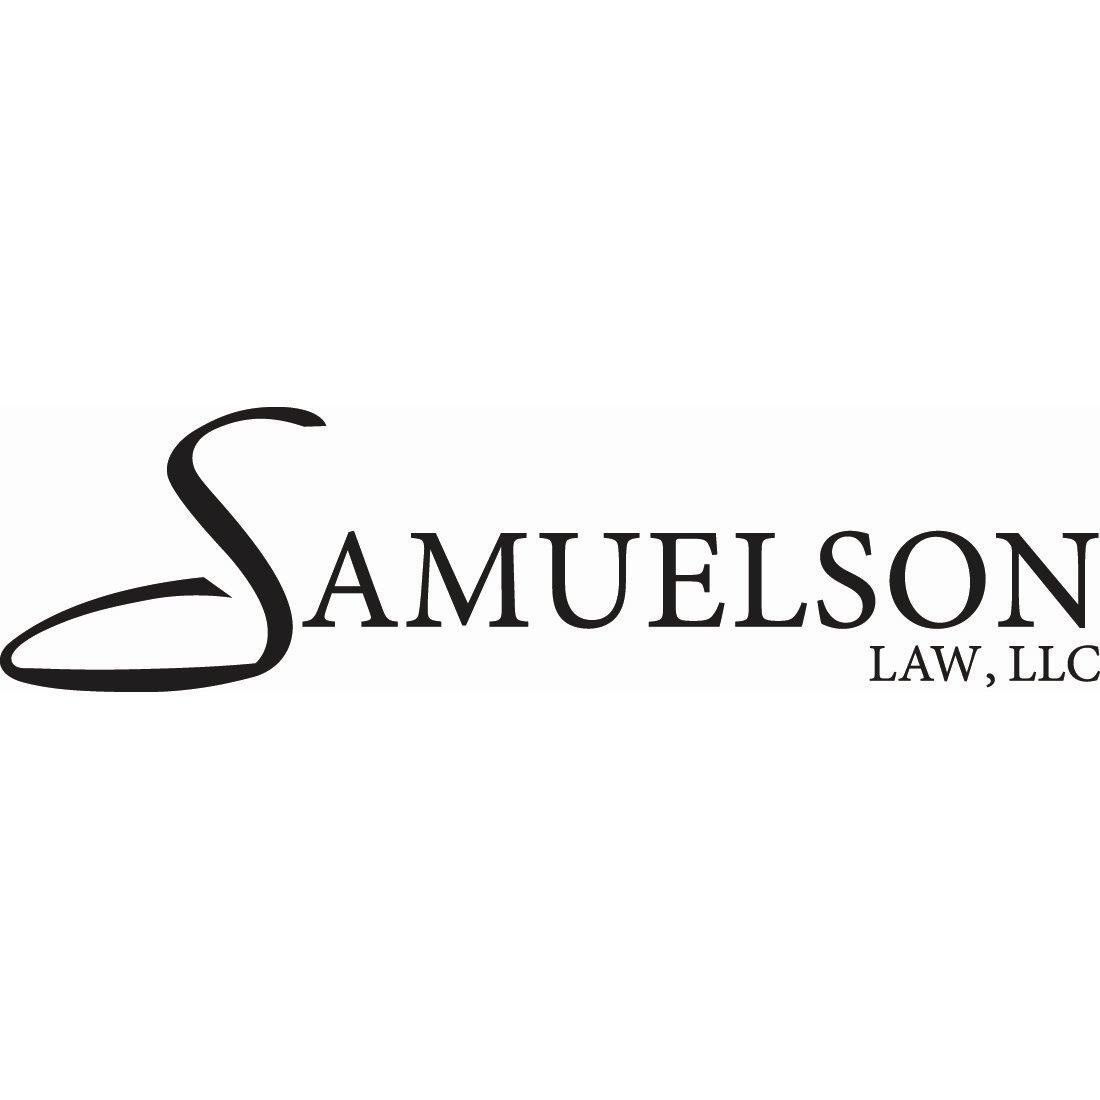 Samuelson Law, LLC